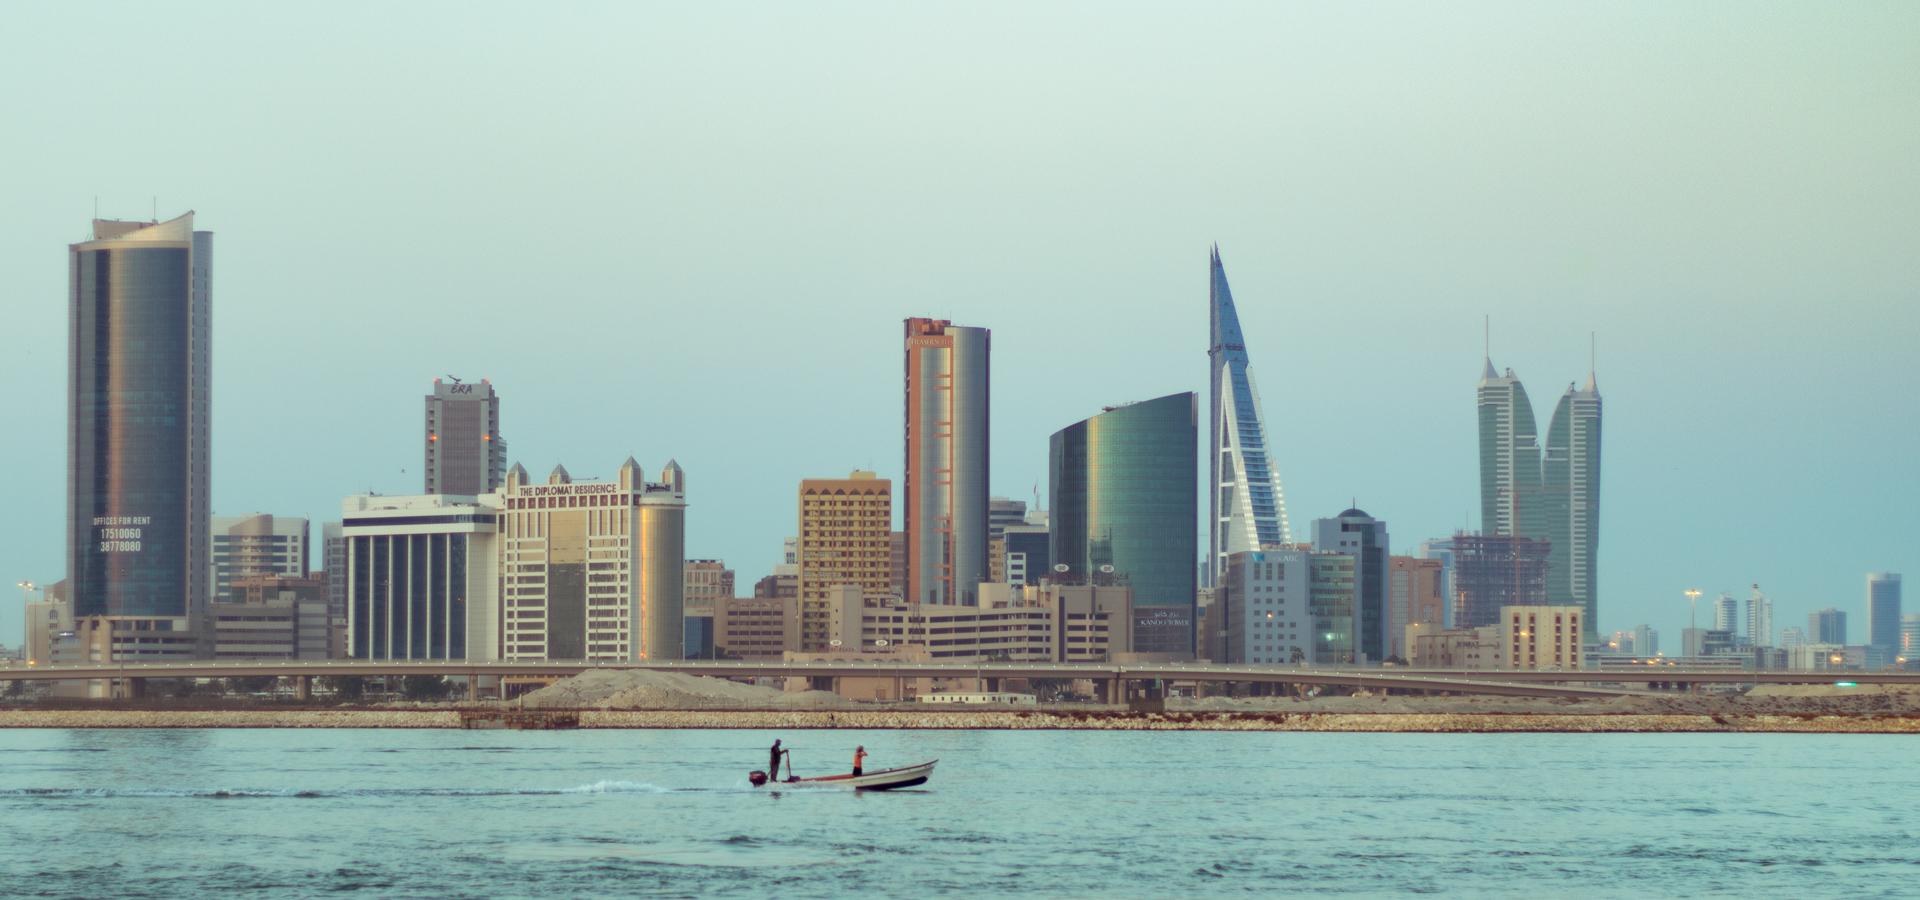 Peer-to-peer advisory in Bahrain, Manama